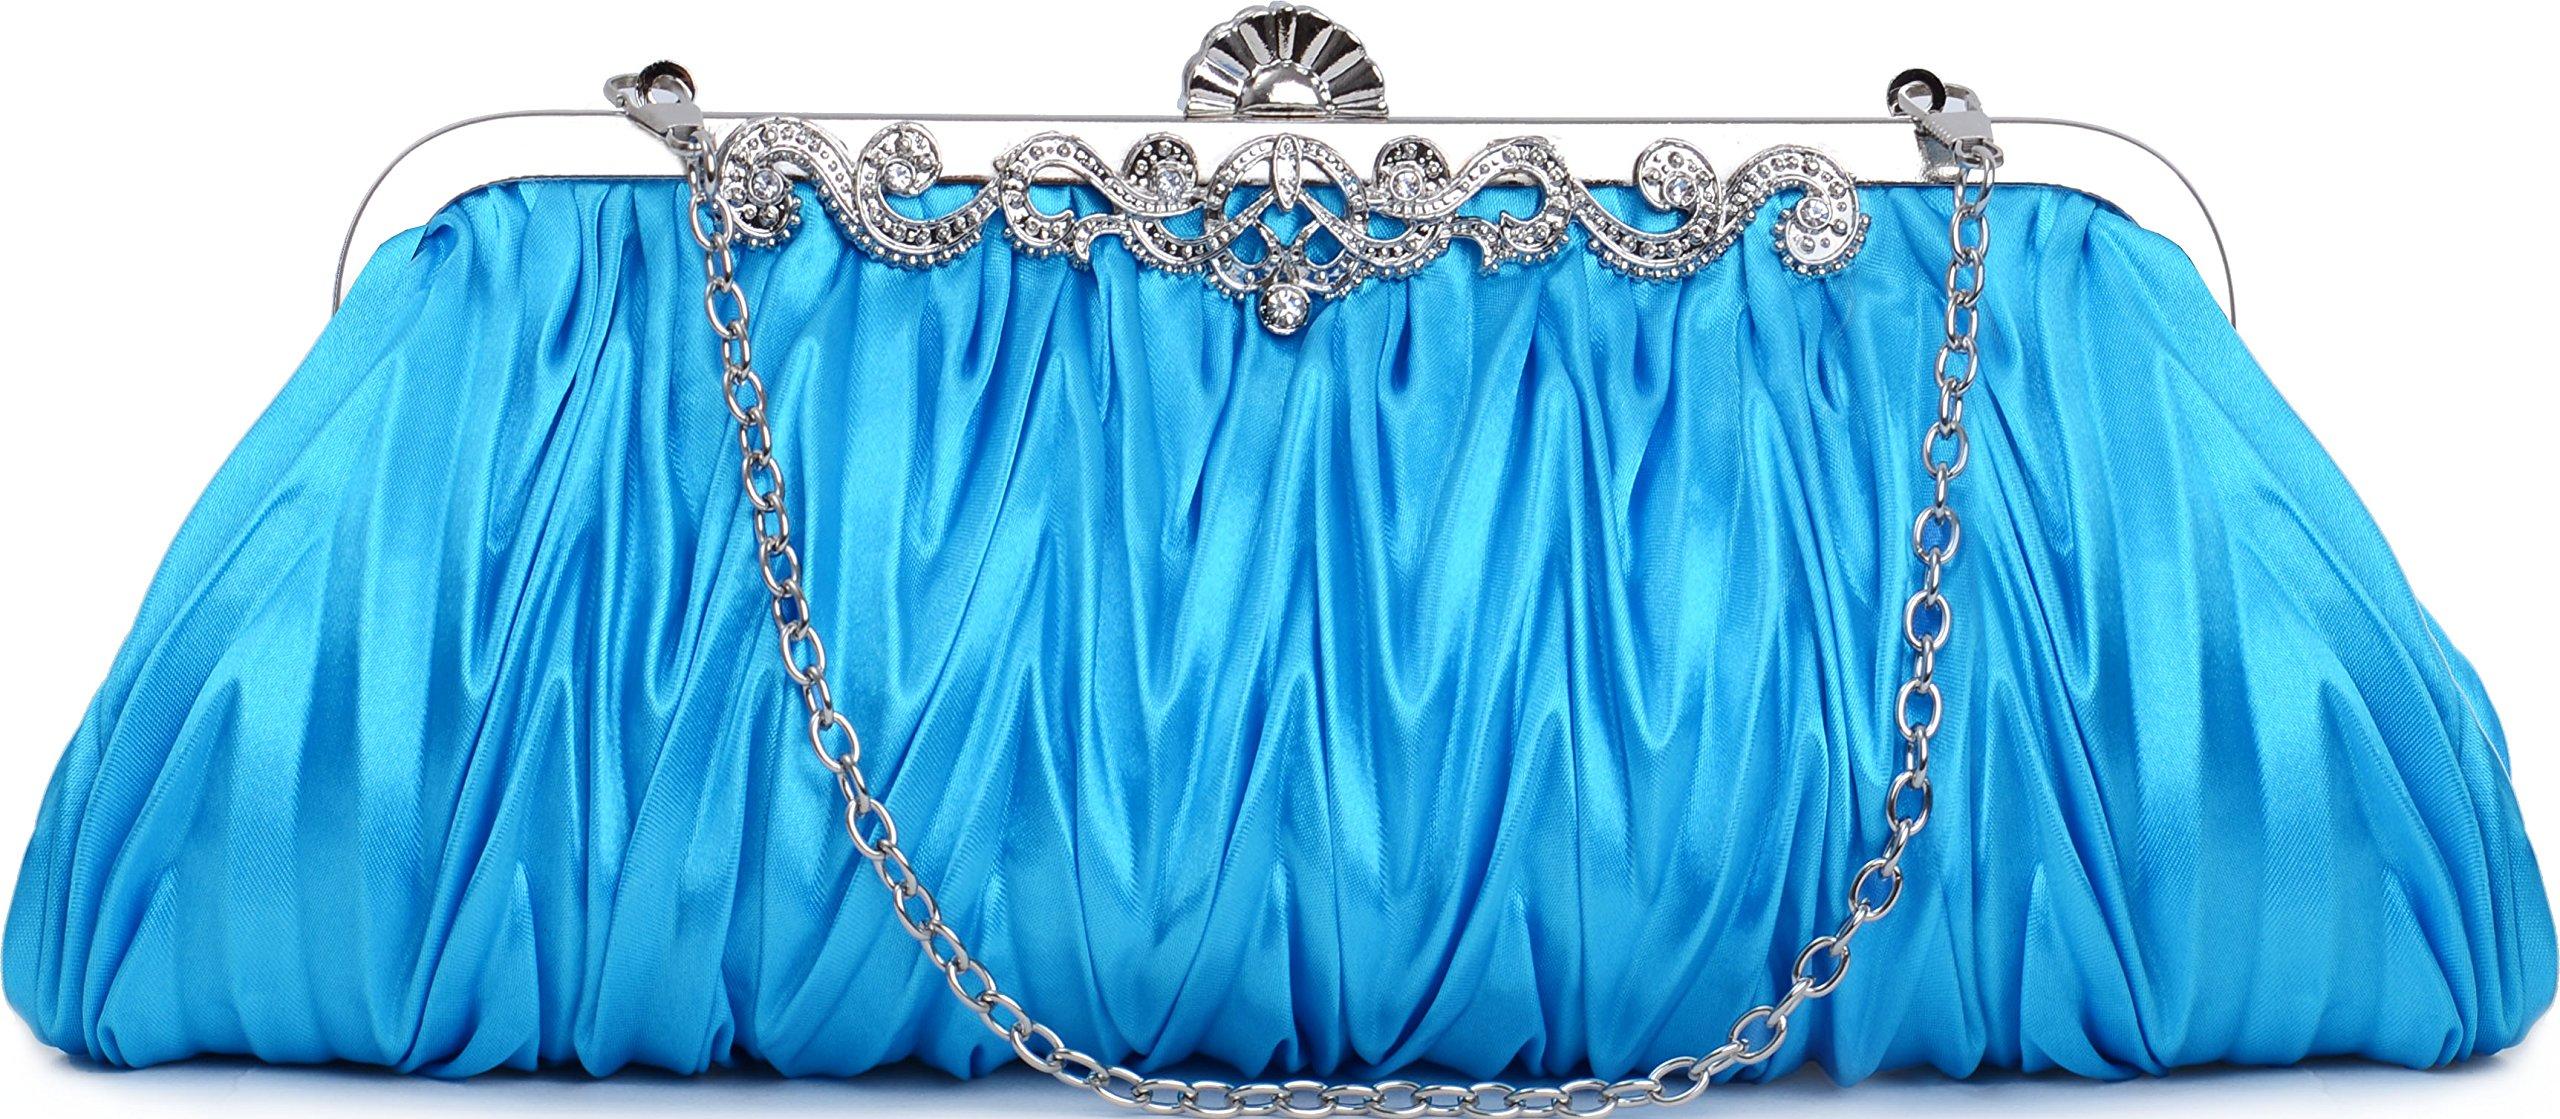 Pulama Romantic Love Bridal Wallet For Wedding Evening Party Bag Purse, Sky Blue